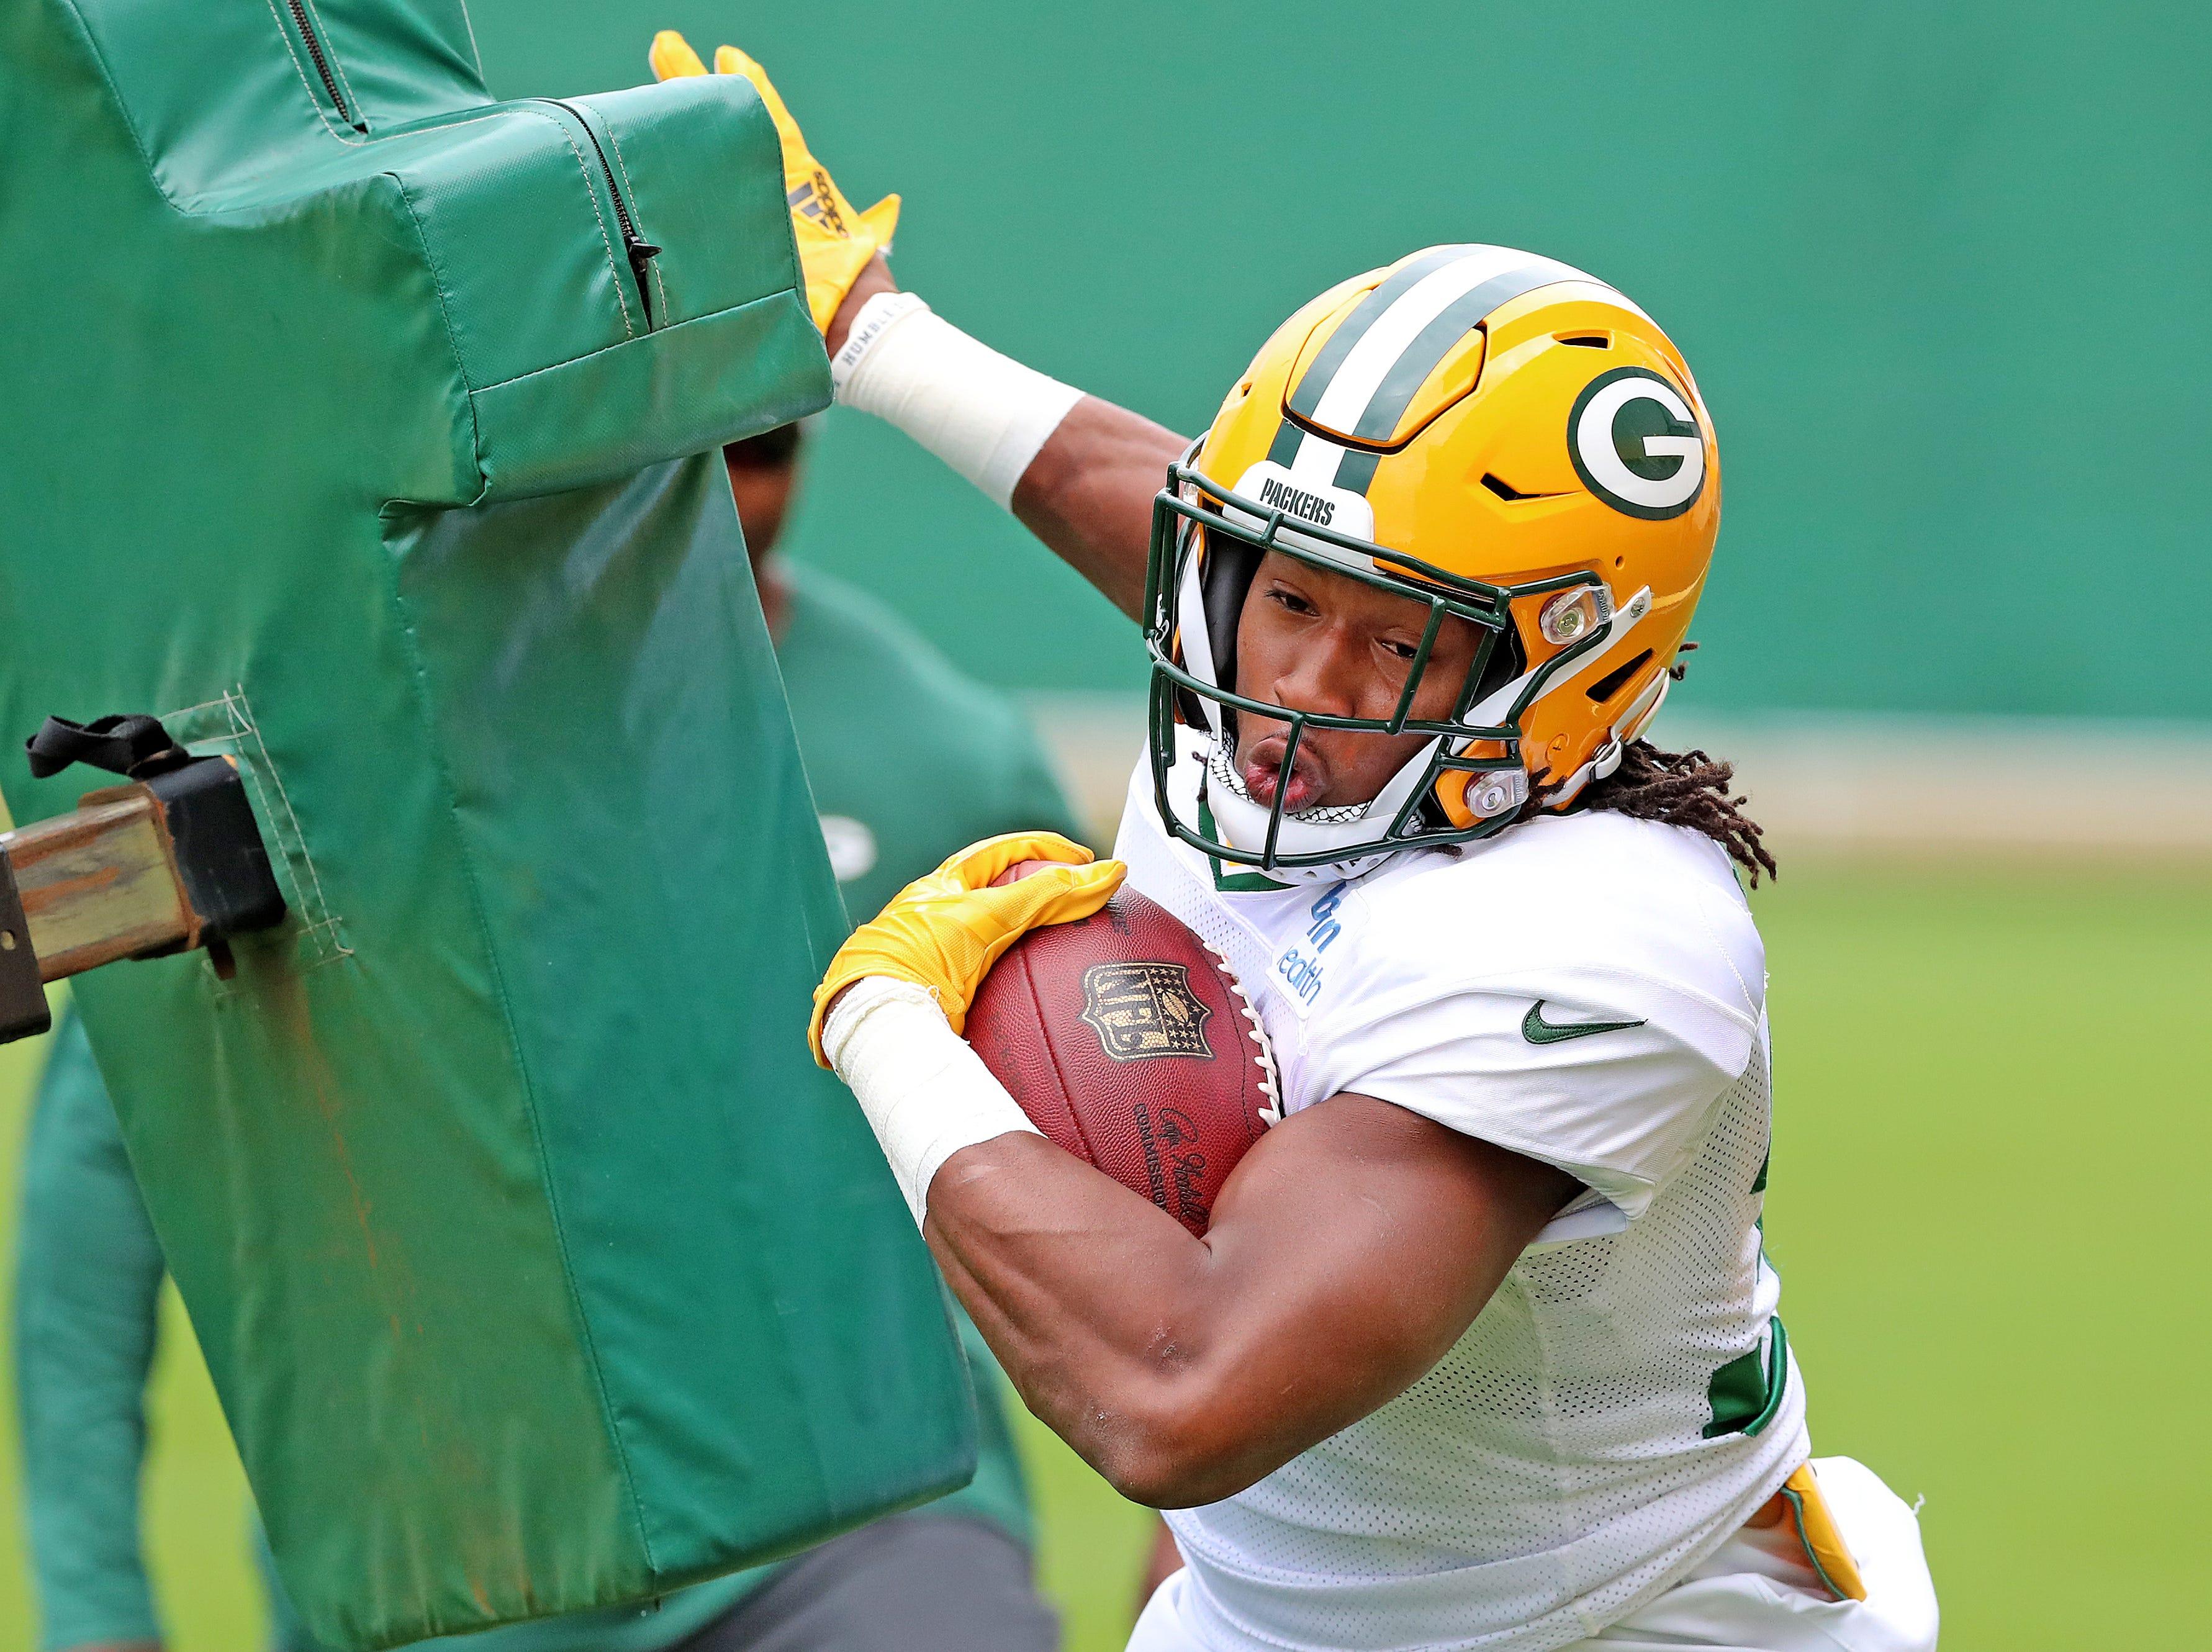 Green Bay Packers running back Aaron Jones (33) during practice on Clarke Hinkle Field Thursday, September 27, 2018 in Ashwaubenon, Wis